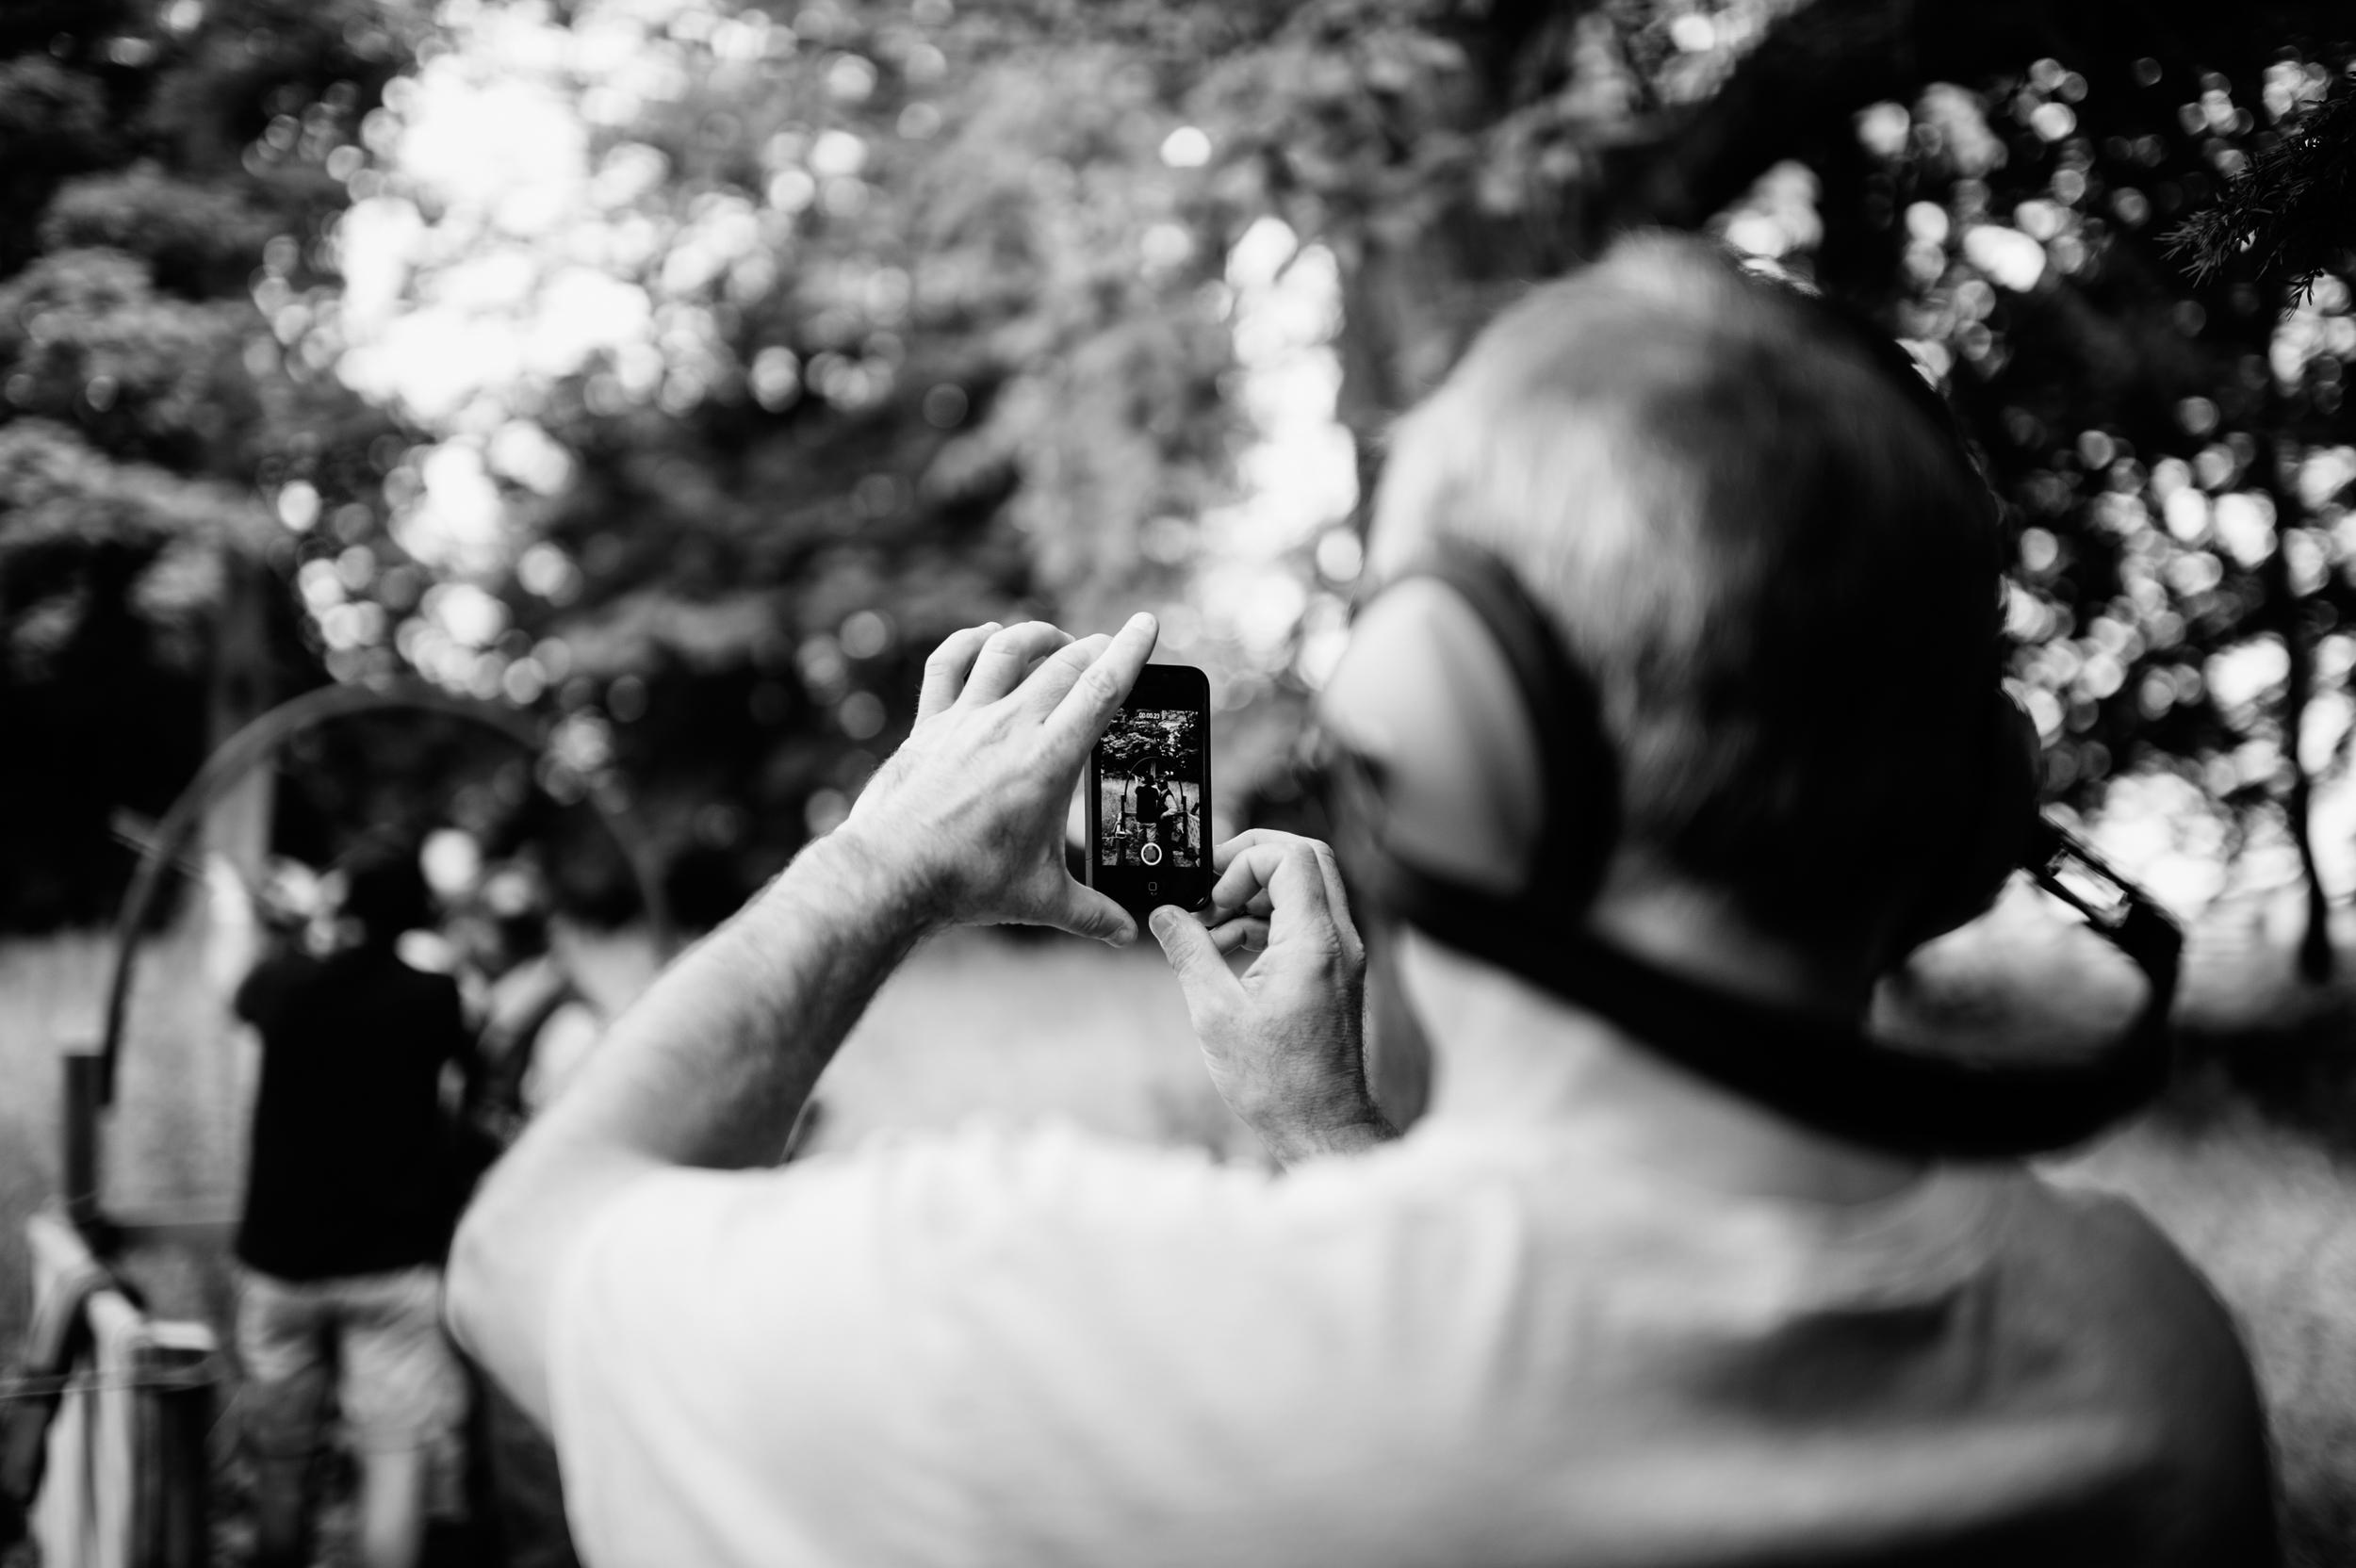 0005-lisa-devine-alternative-creative-wedding-photography-glasgow-edinburgh.JPG